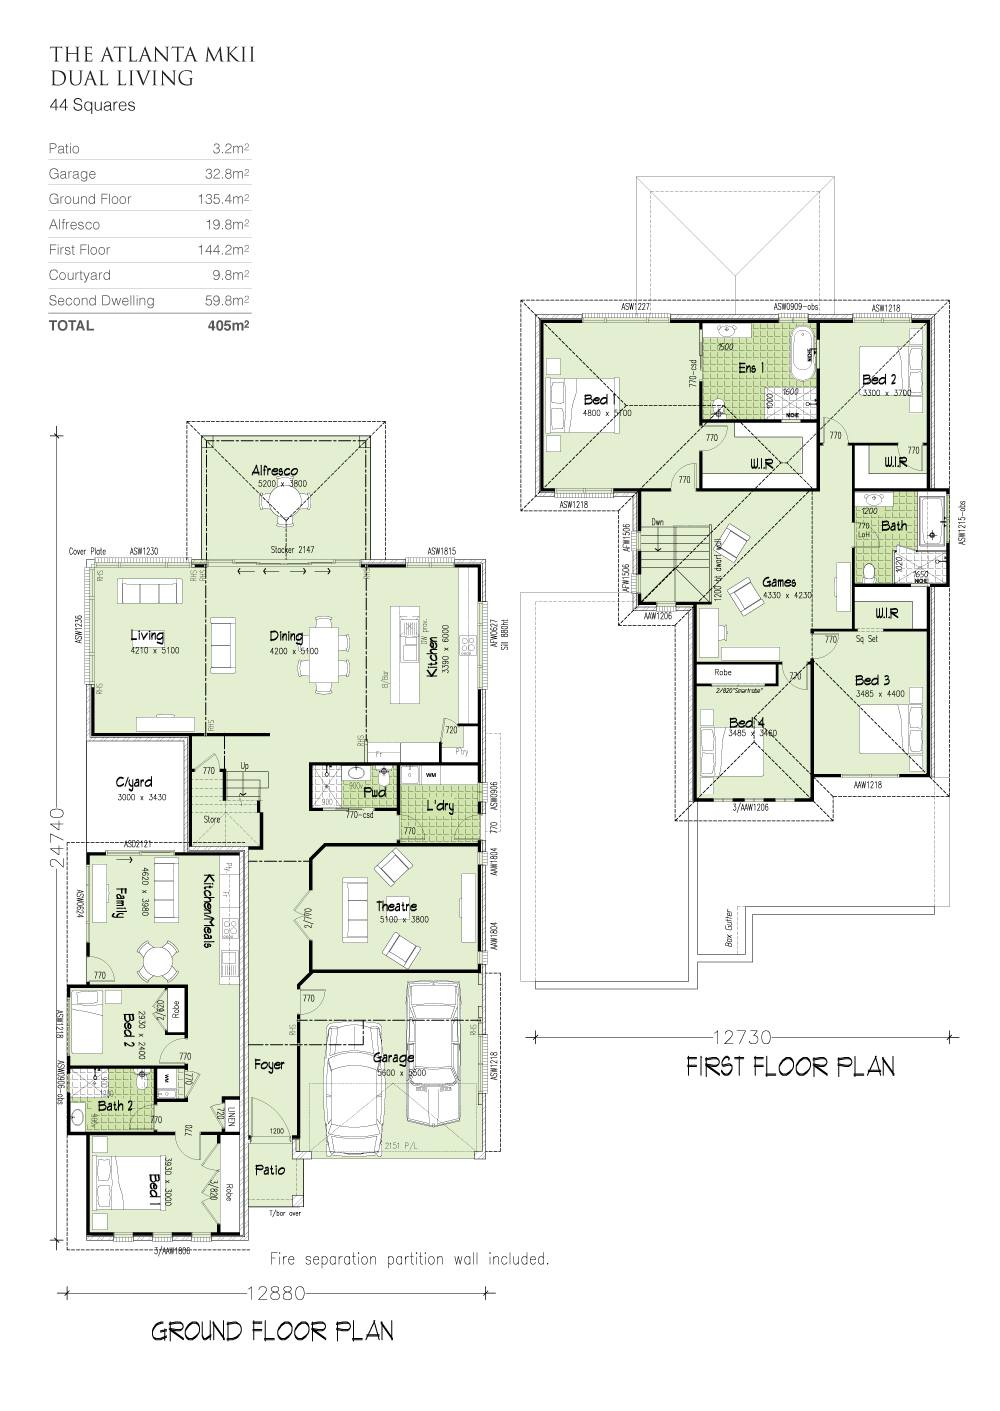 Atlanta MKII Dual Living, Home Design, Tullipan Homes